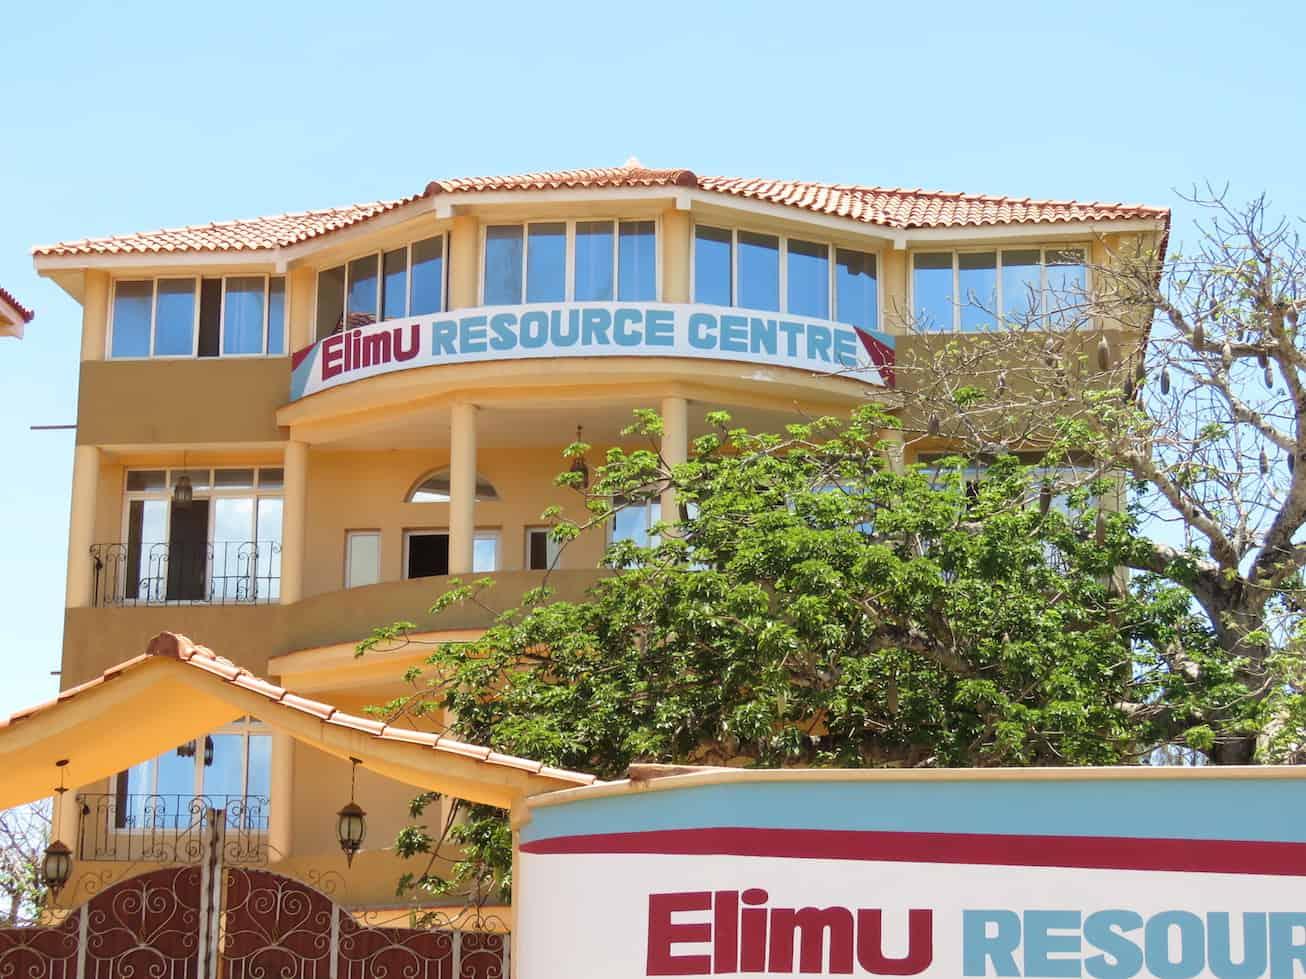 Elimu e-hub Cow-working space